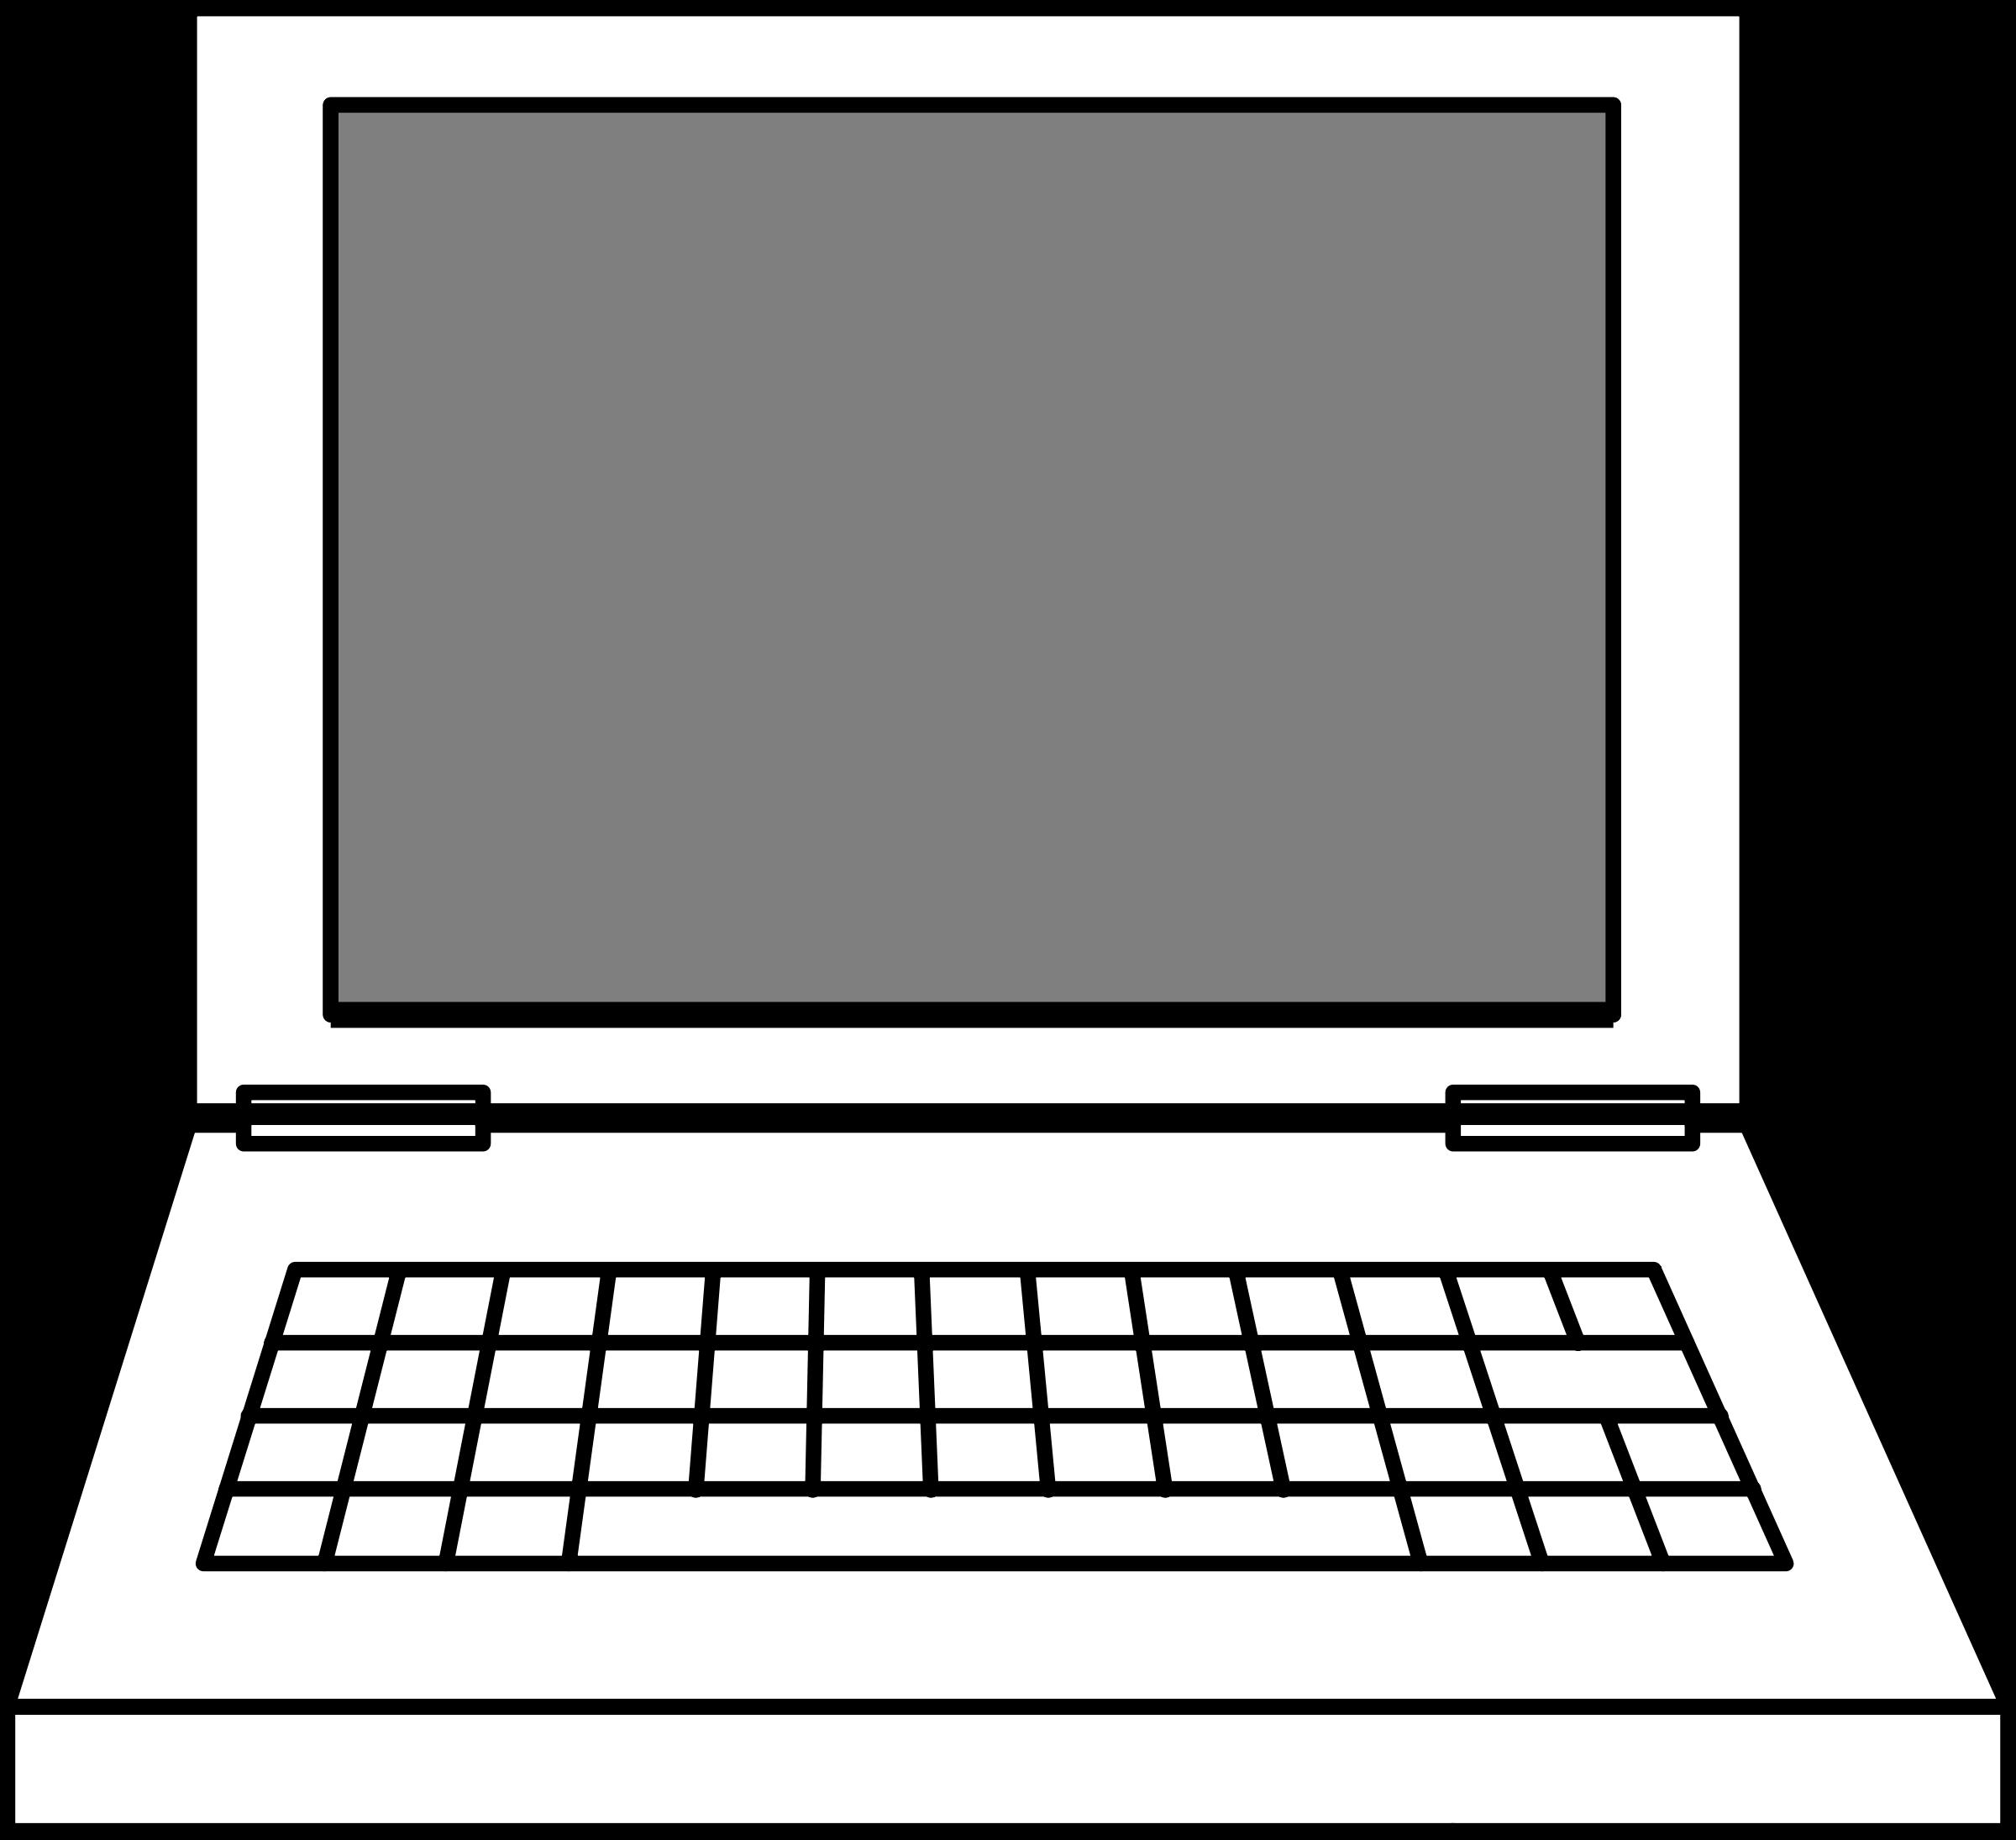 Black kid on computer clipart image transparent download Free Computer Clip Art, Download Free Clip Art, Free Clip Art on ... image transparent download